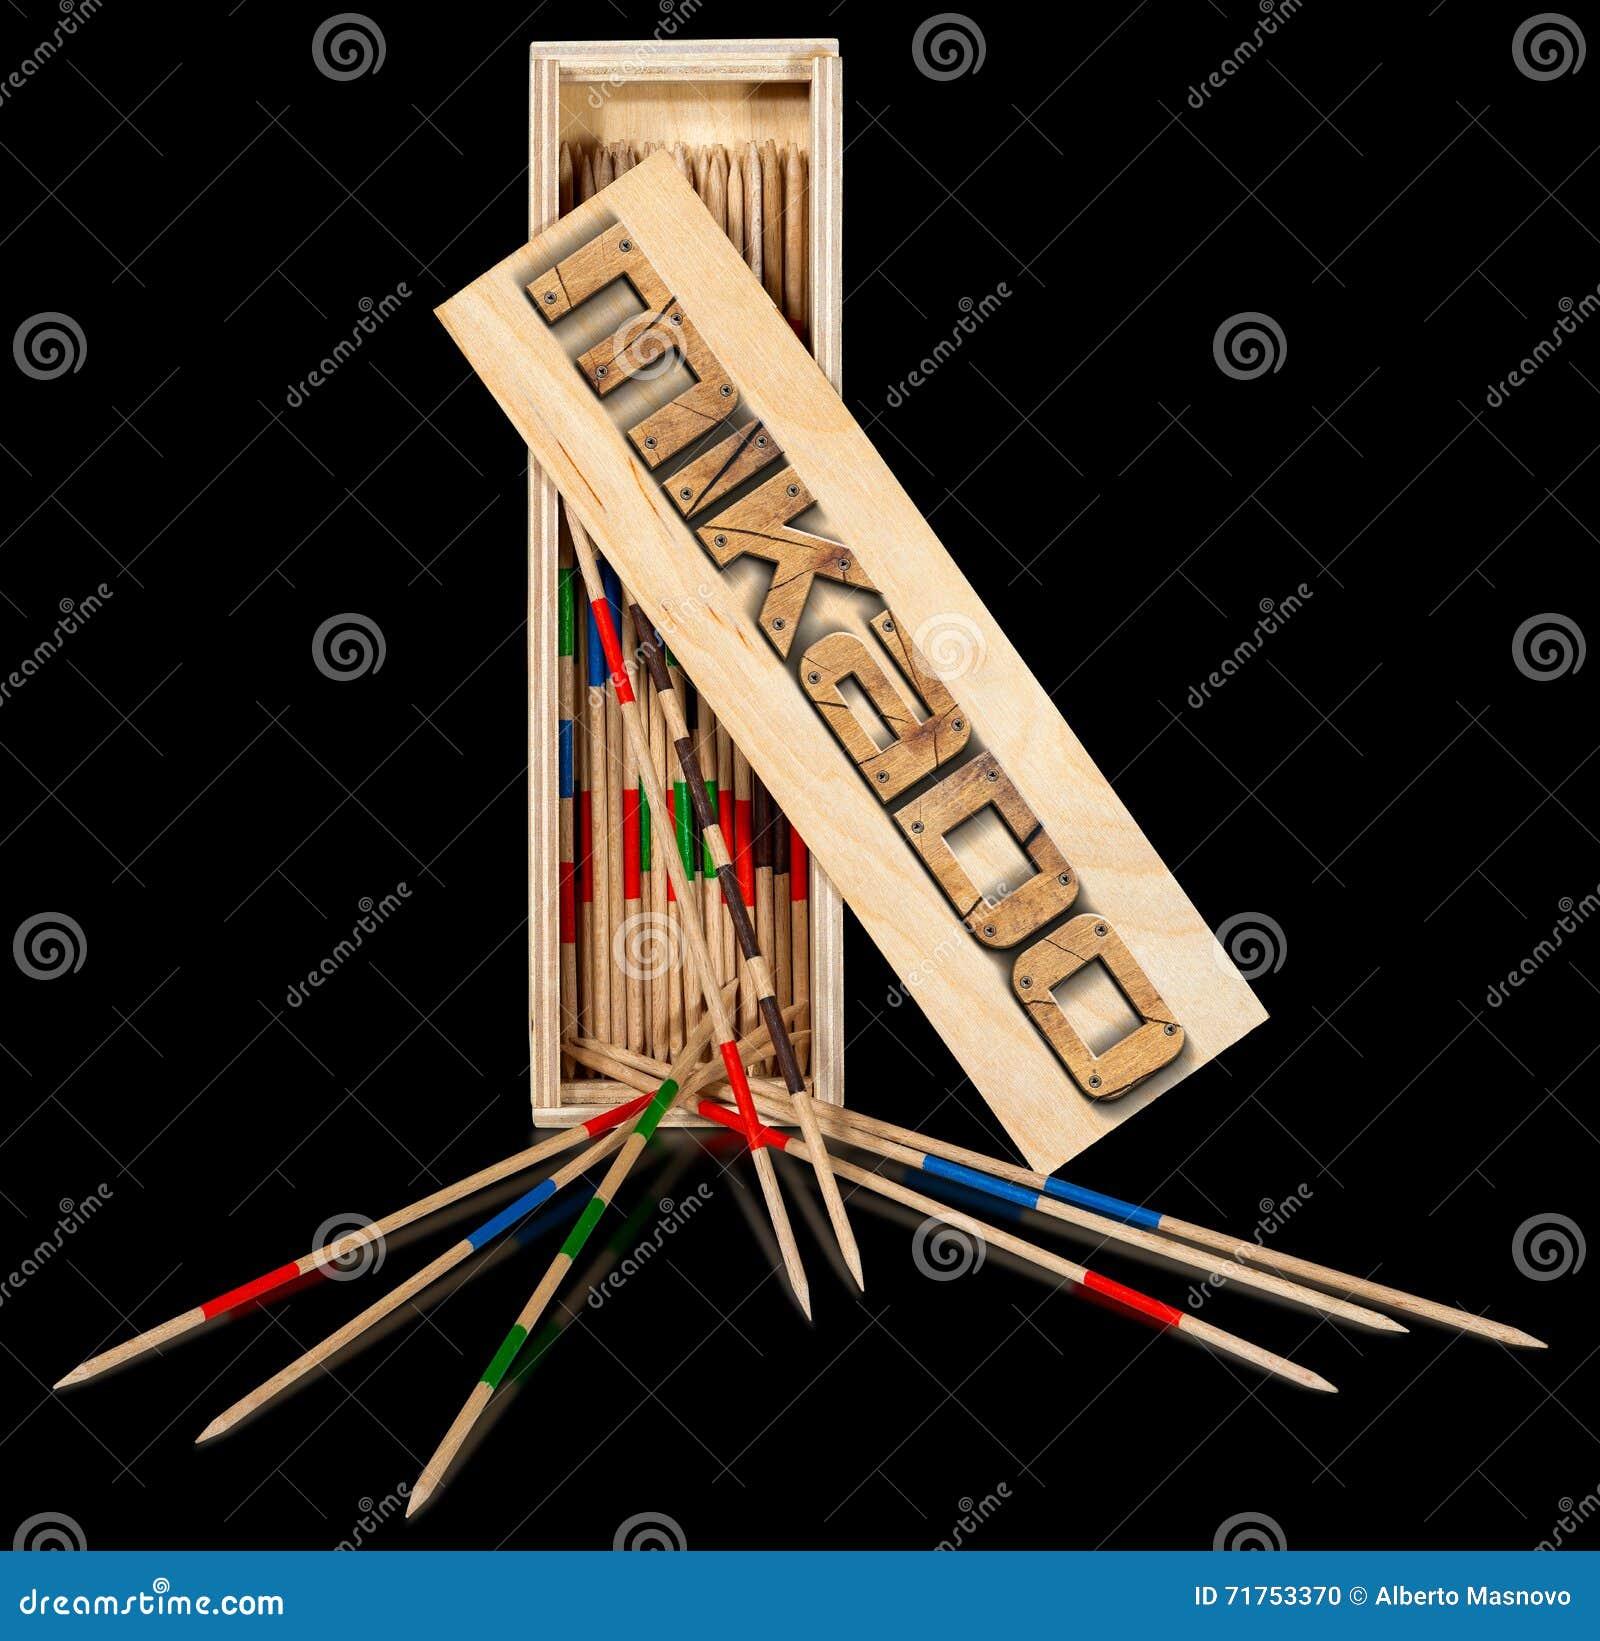 Mikado - ξύλινα ραβδιά και κιβώτιο